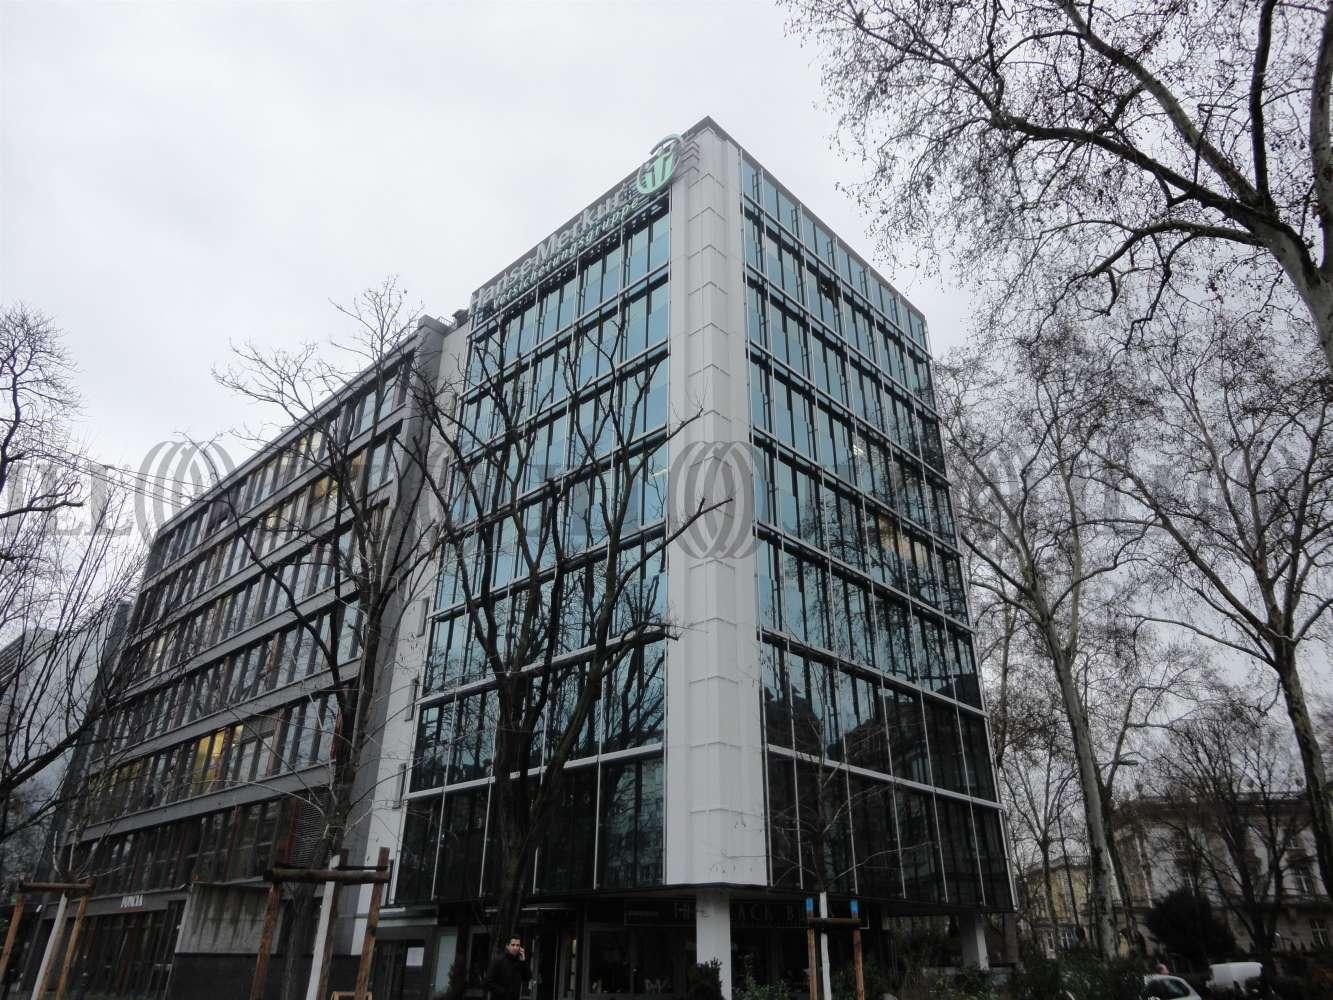 Büros Frankfurt am main, 60323 - Büro - Frankfurt am Main, Westend - F0614 - 10177038